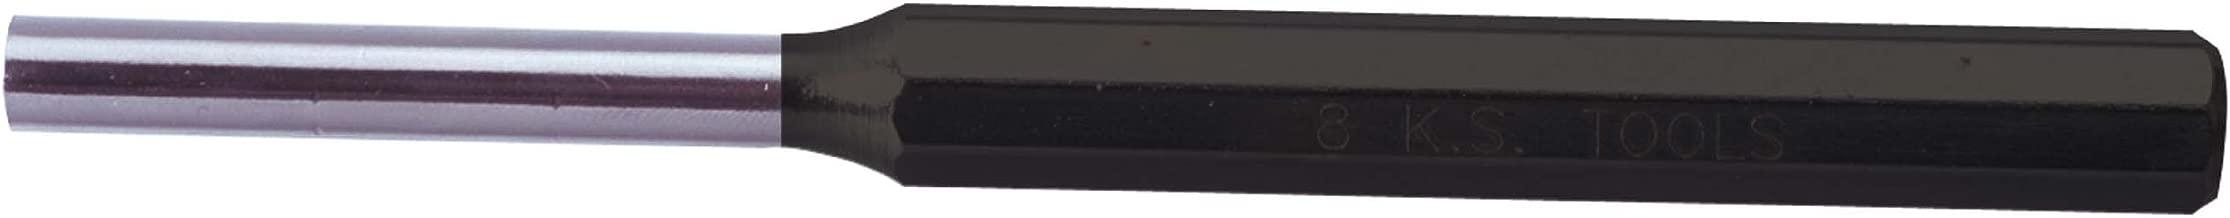 Chasses goupille bruni octogonale 10mm longueur 150mm